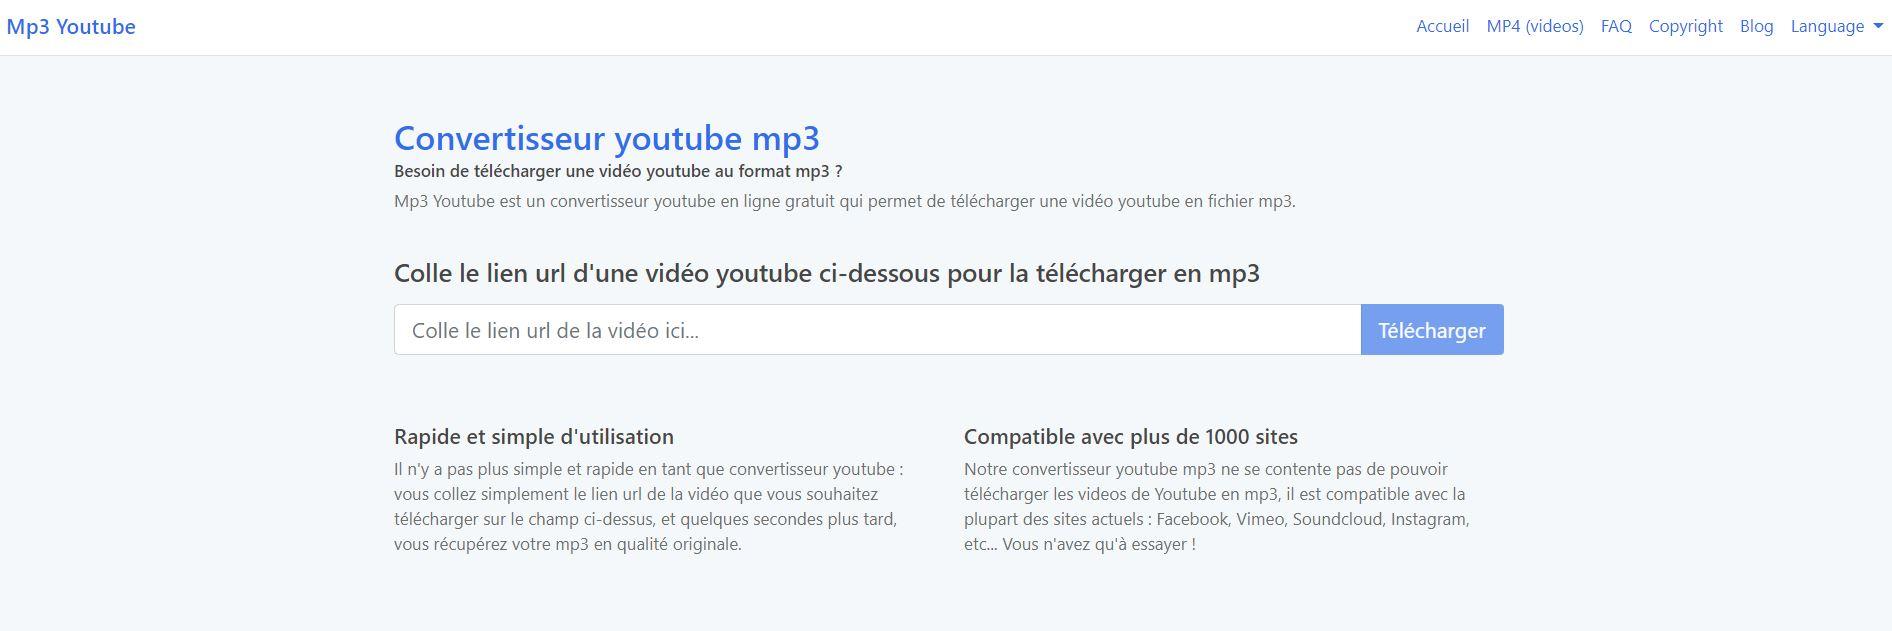 Mp3-YouTube